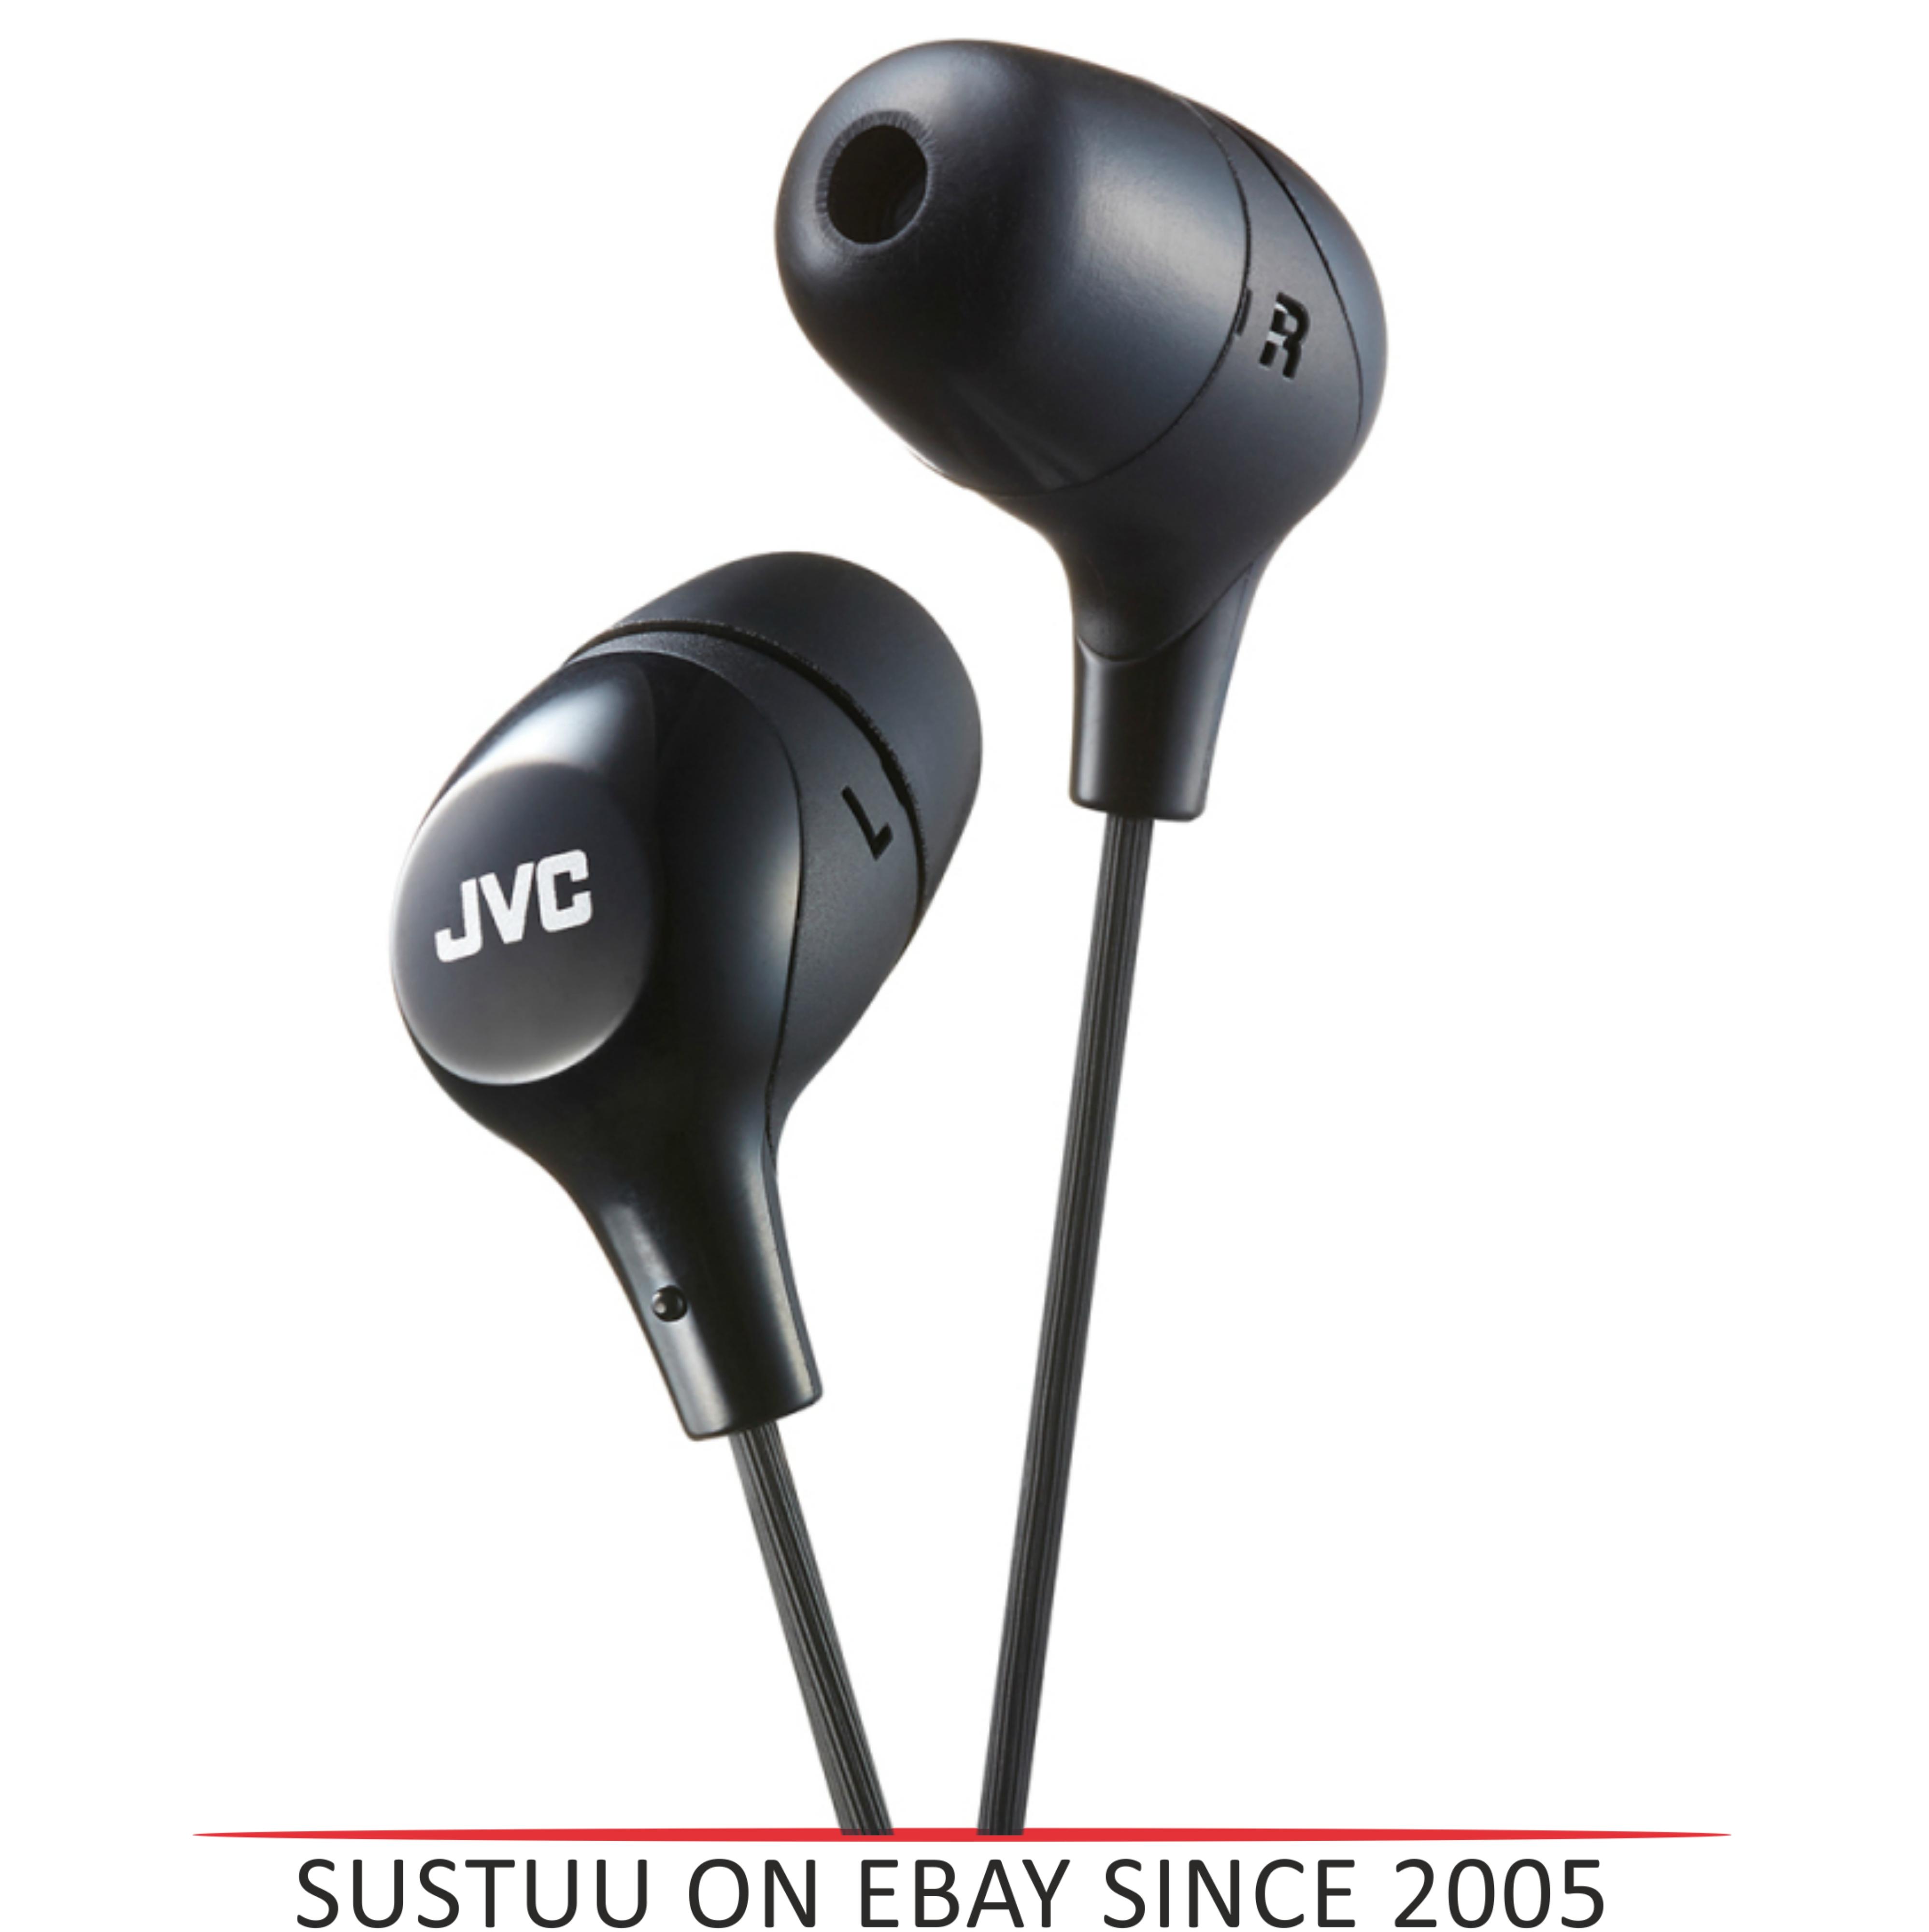 JVC HAFX38B Marshmallow Custom Fit Powerful Sound In-Ear Headphones - Black